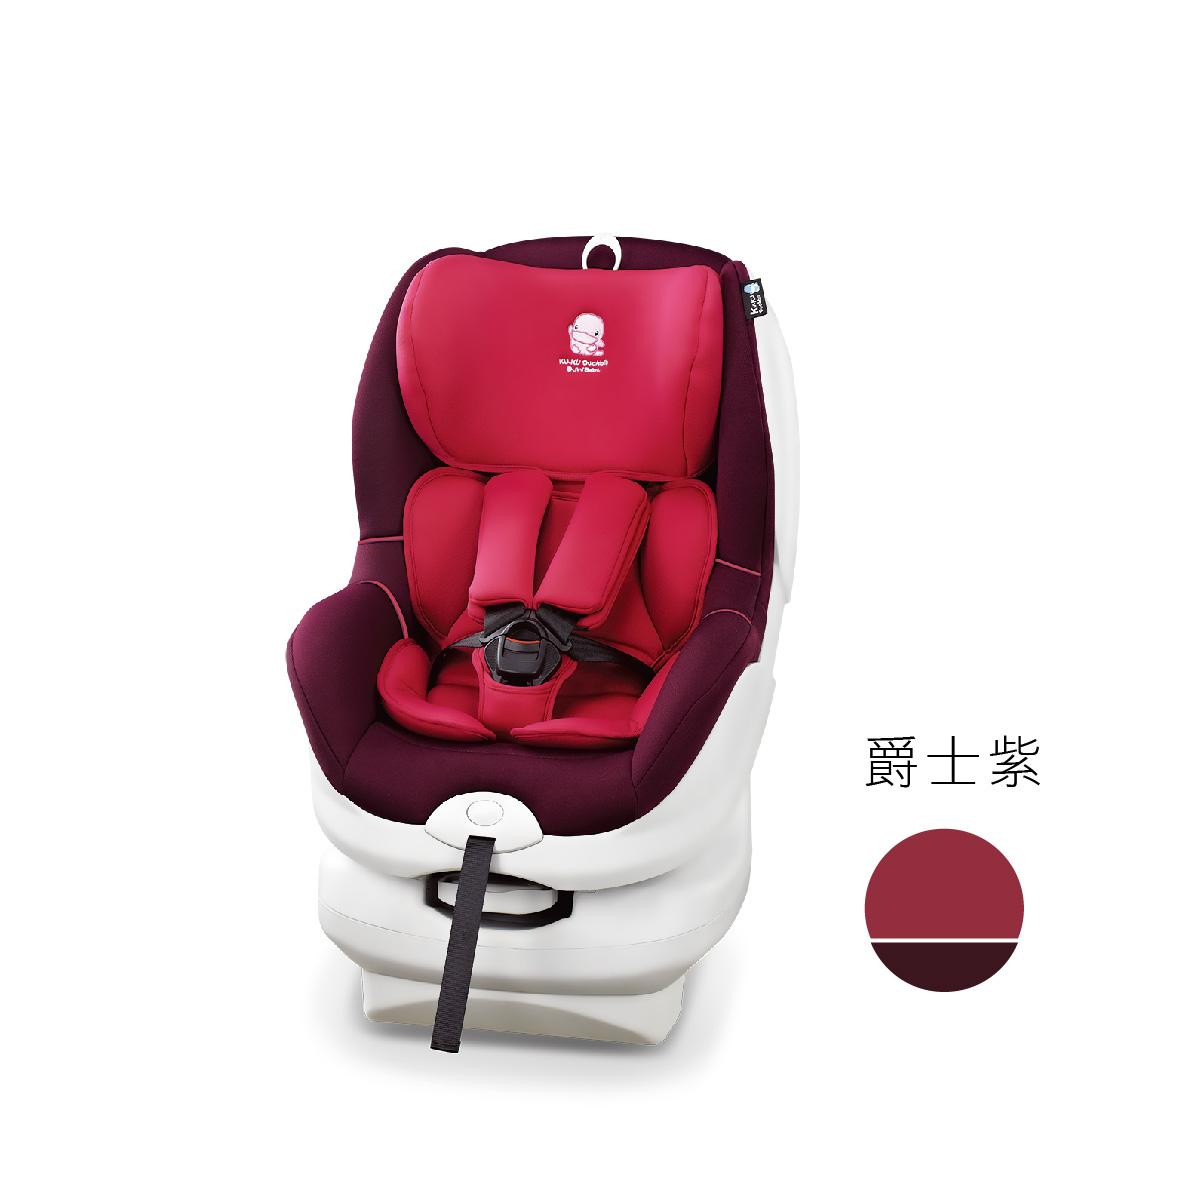 proimages/Tip_Accessories_Series/safety_seat/6039/6039_EDM_1200x1200-3-21.jpg